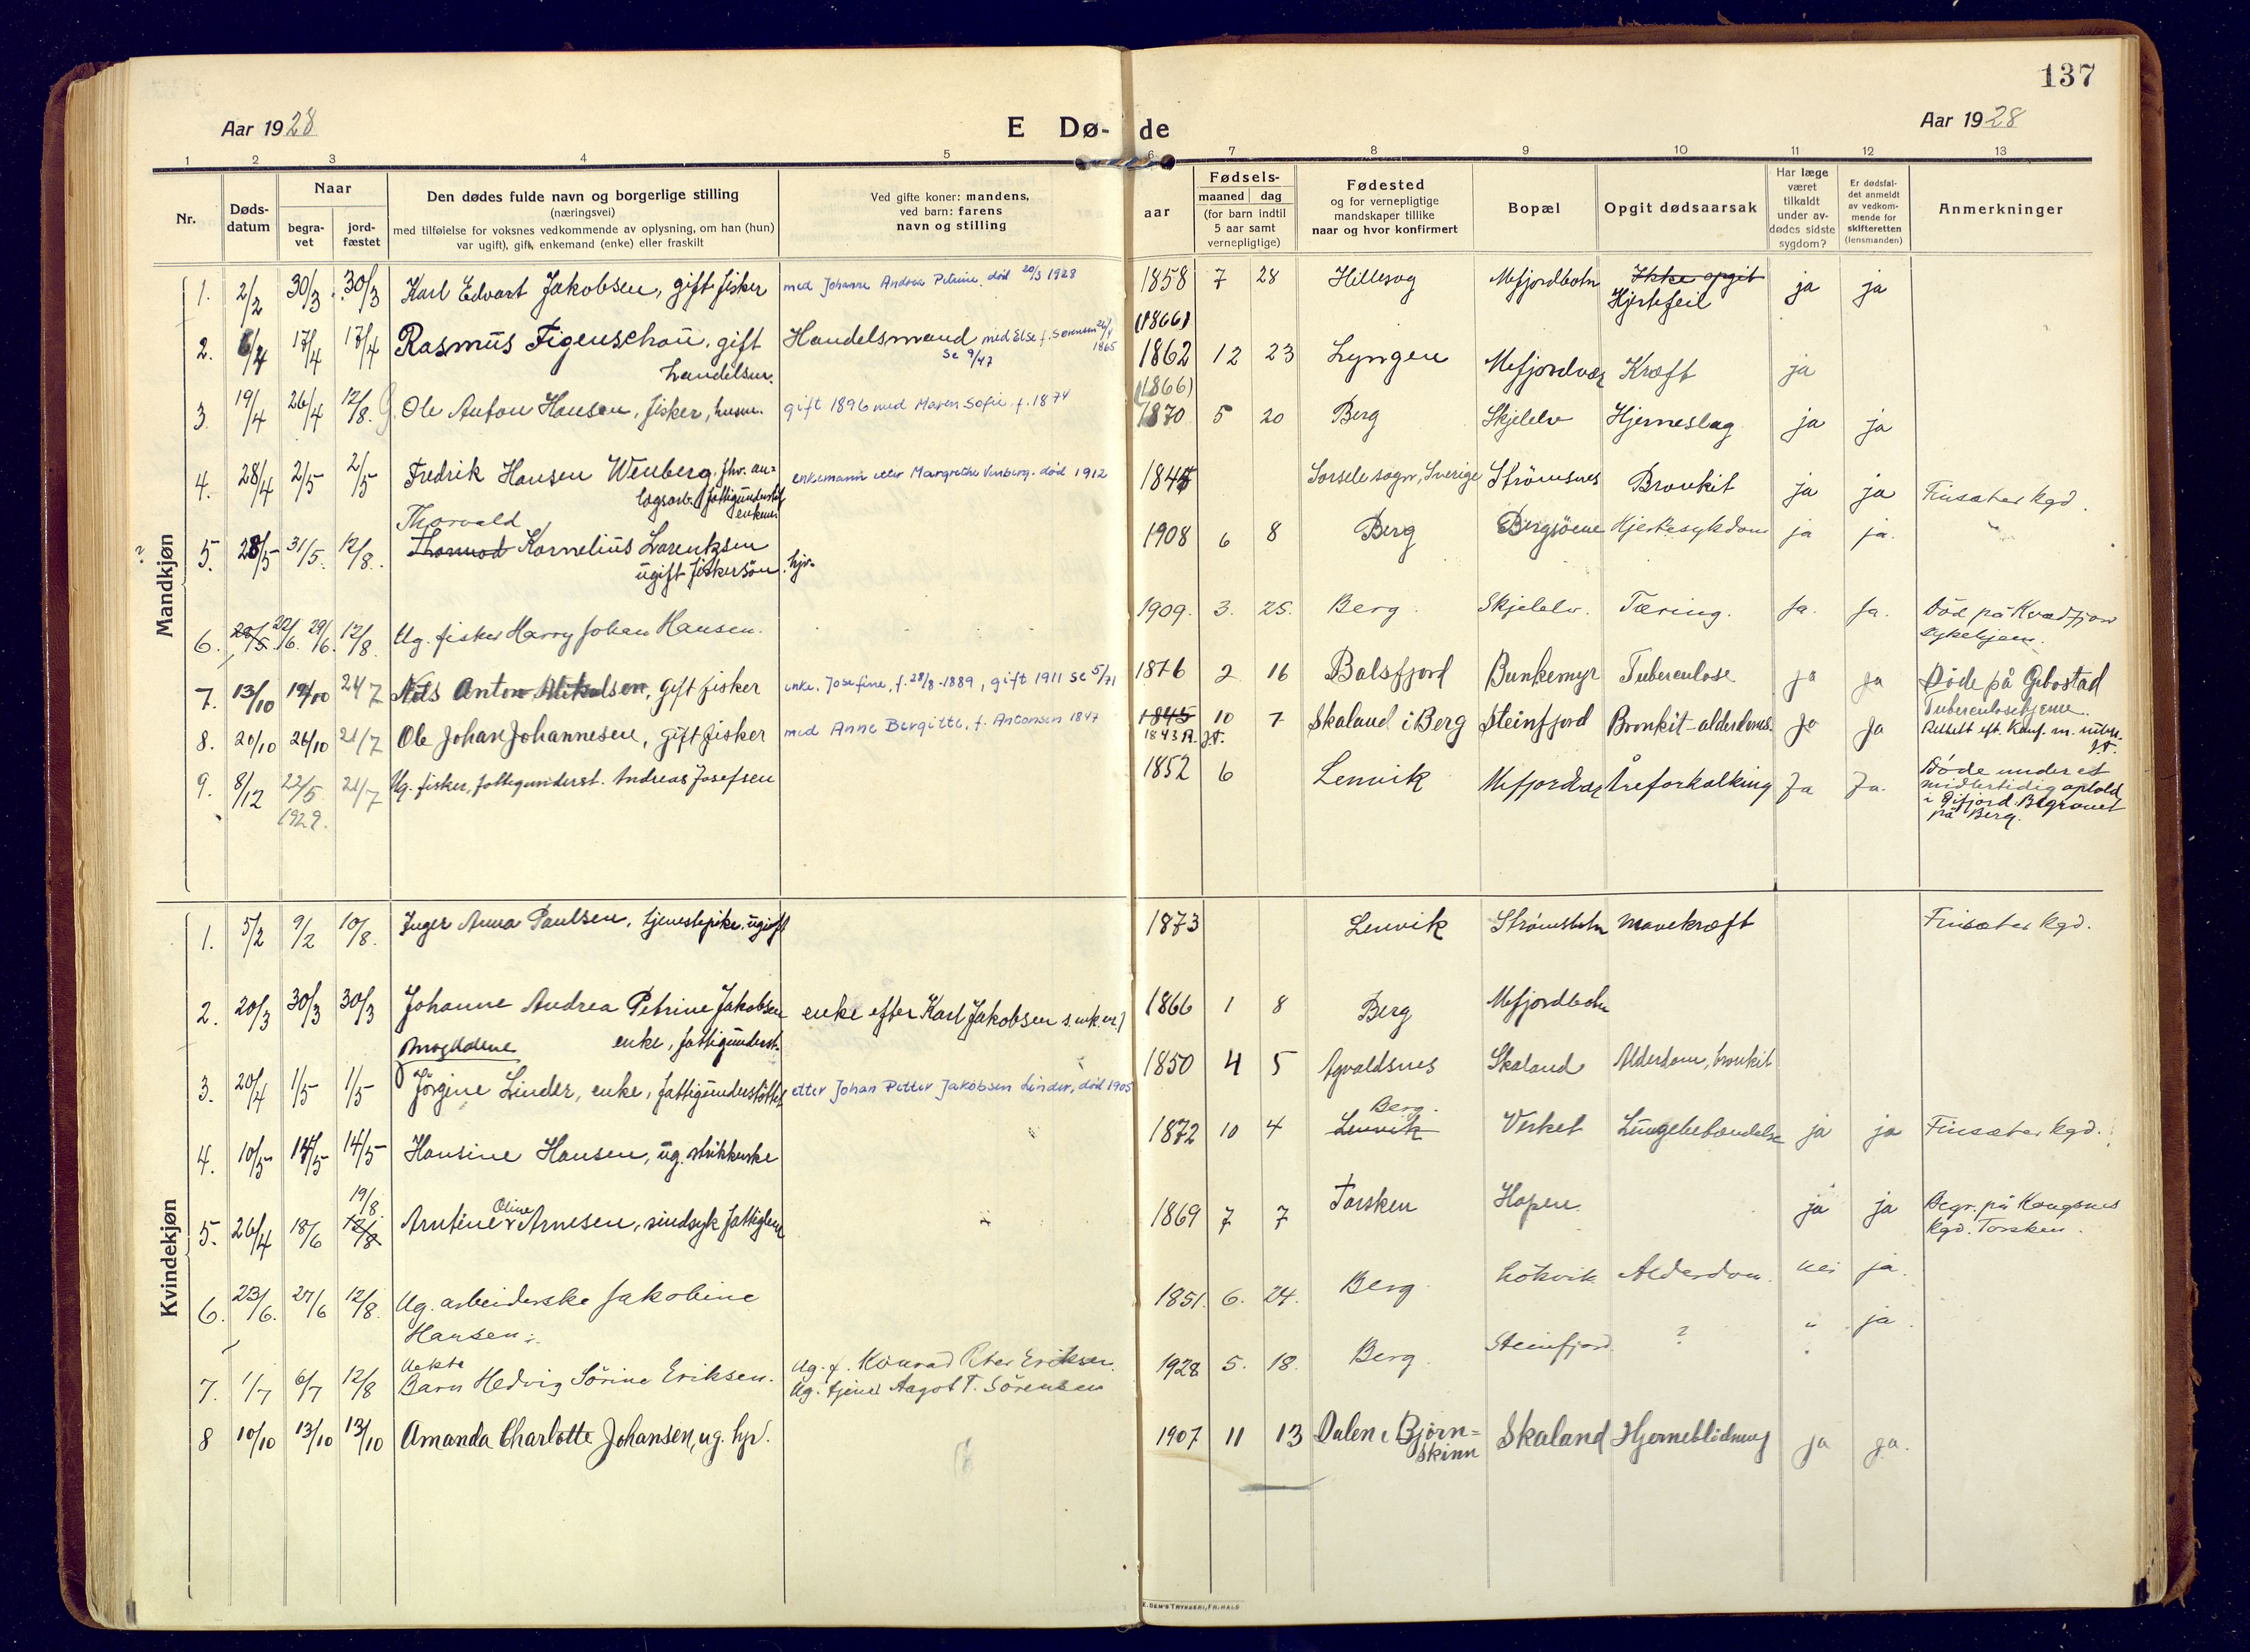 SATØ, Mefjord/Berg sokneprestkontor, G/Ga/Gaa: Ministerialbok nr. 9, 1916-1928, s. 137